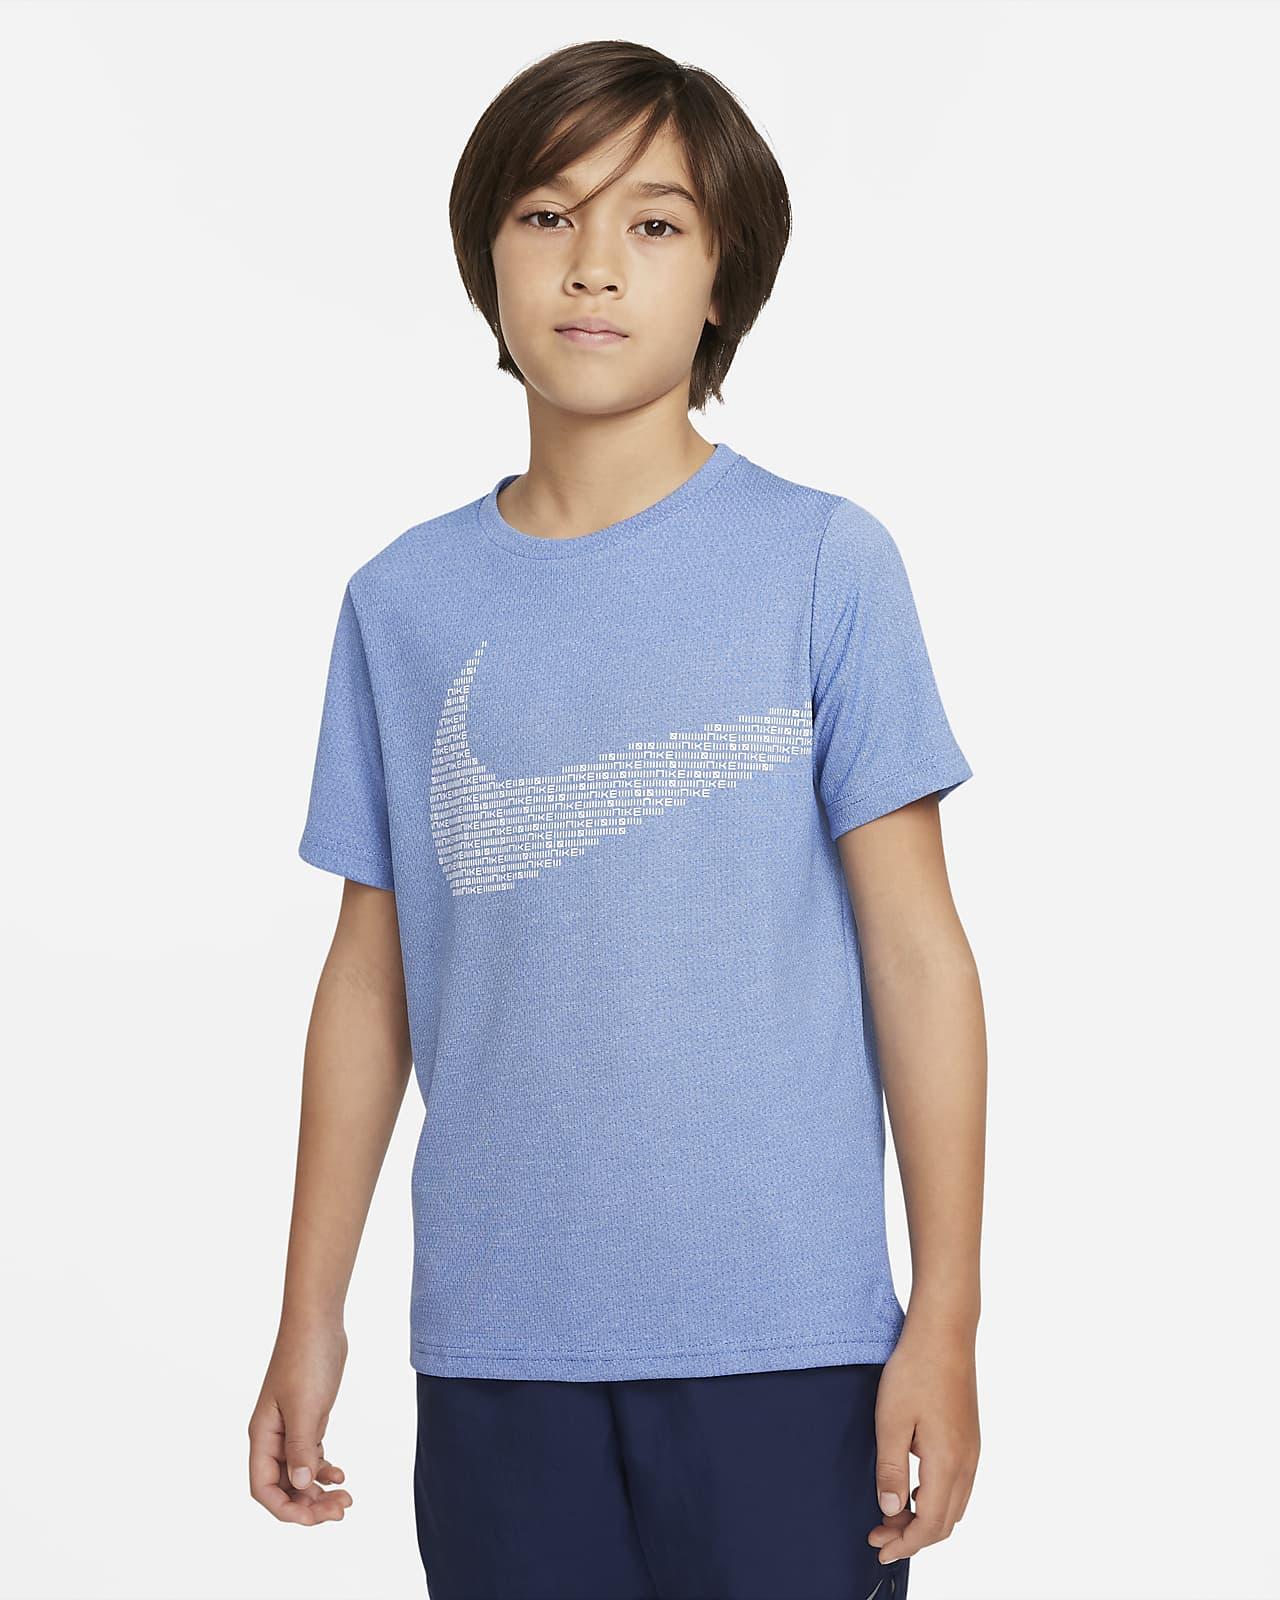 Nike Big Kids' (Boys') Training Top